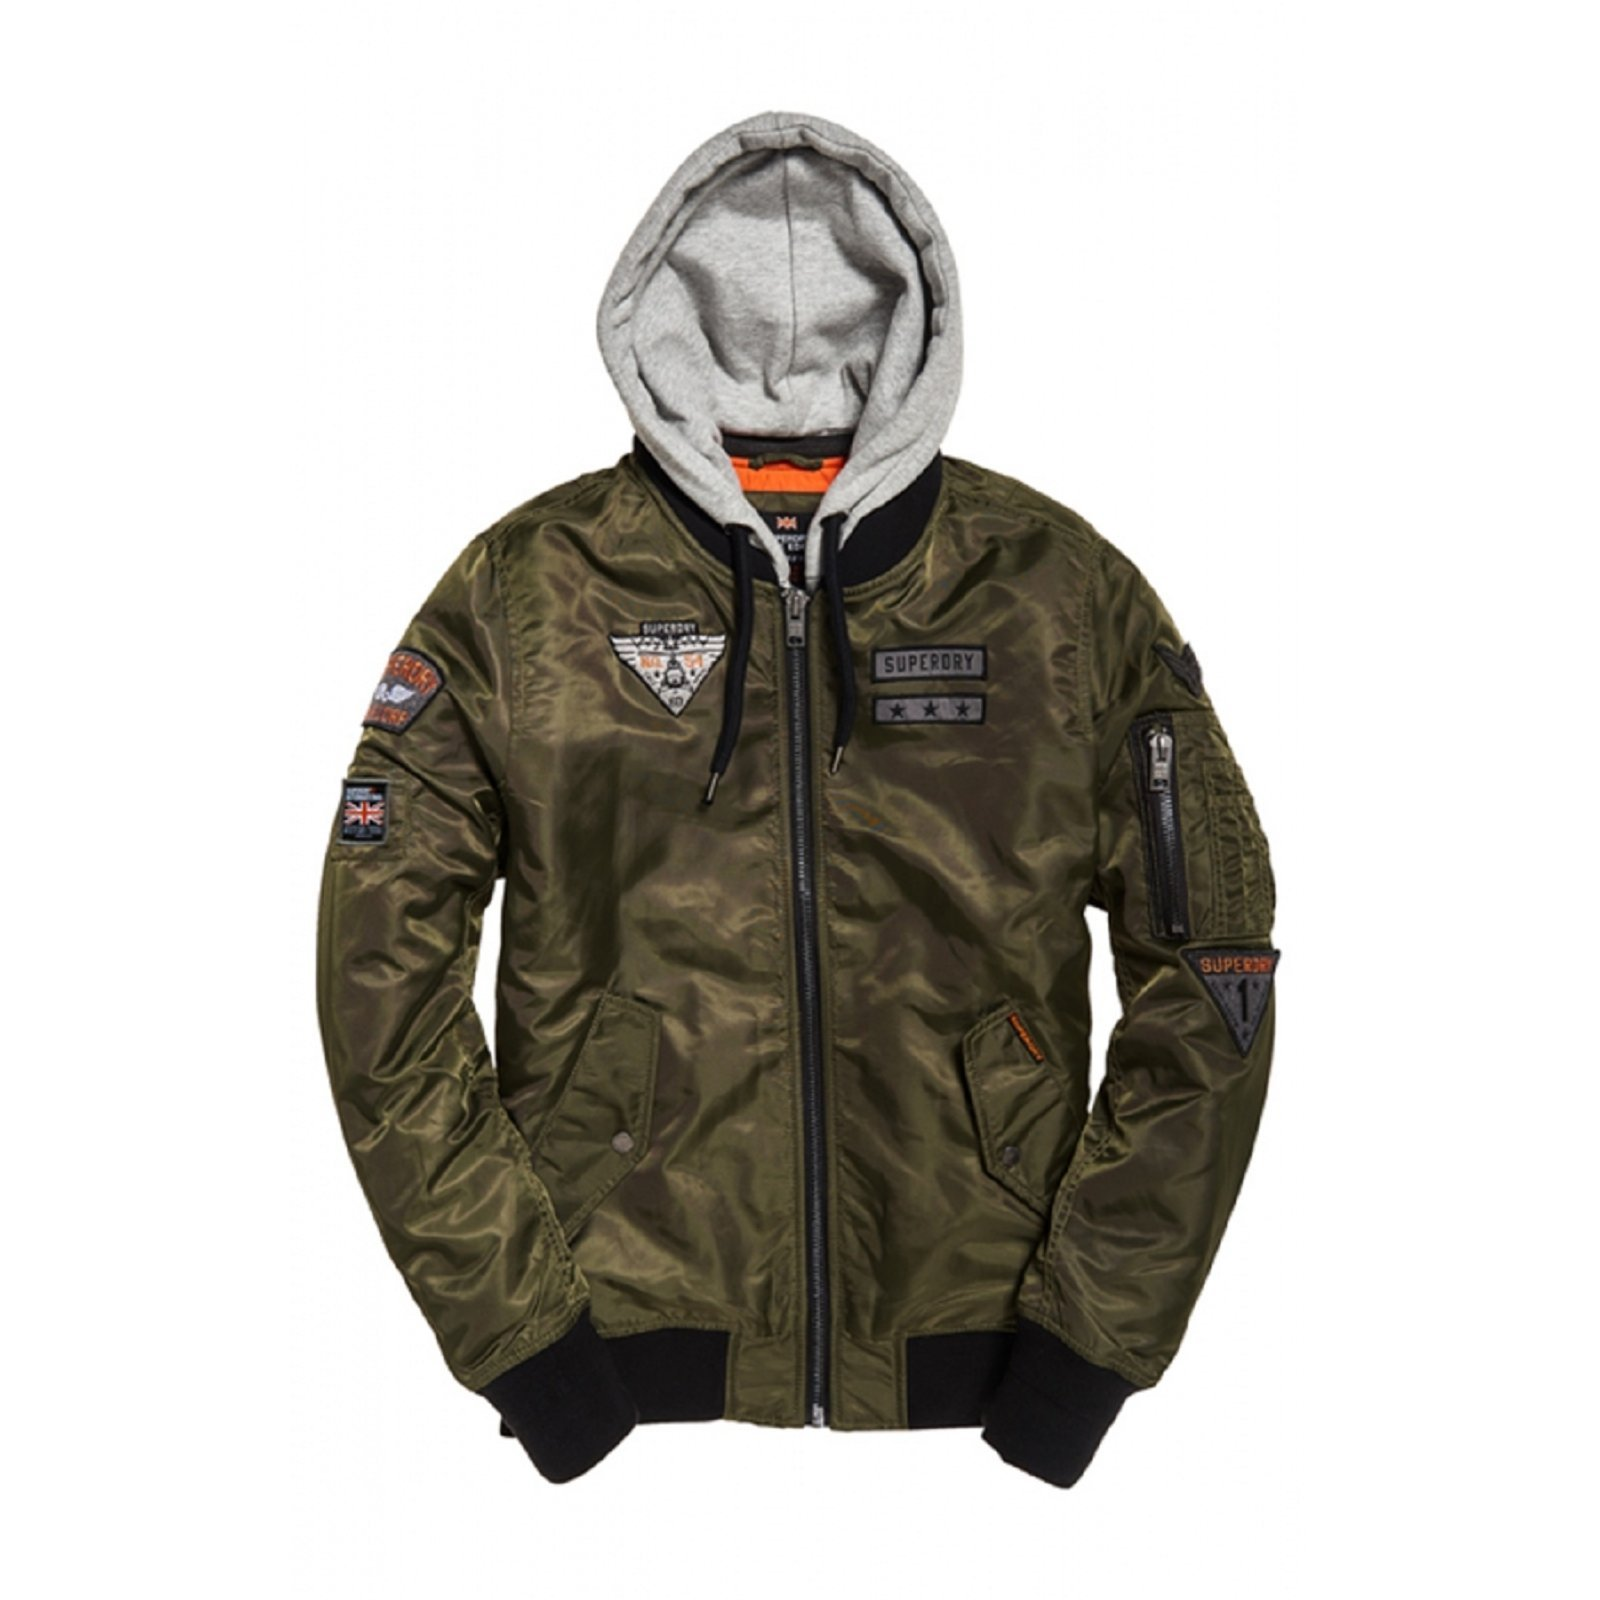 Homme Vest Premium Goods Splatter ModeLifestyle Superdry Paint FTlcuK135J